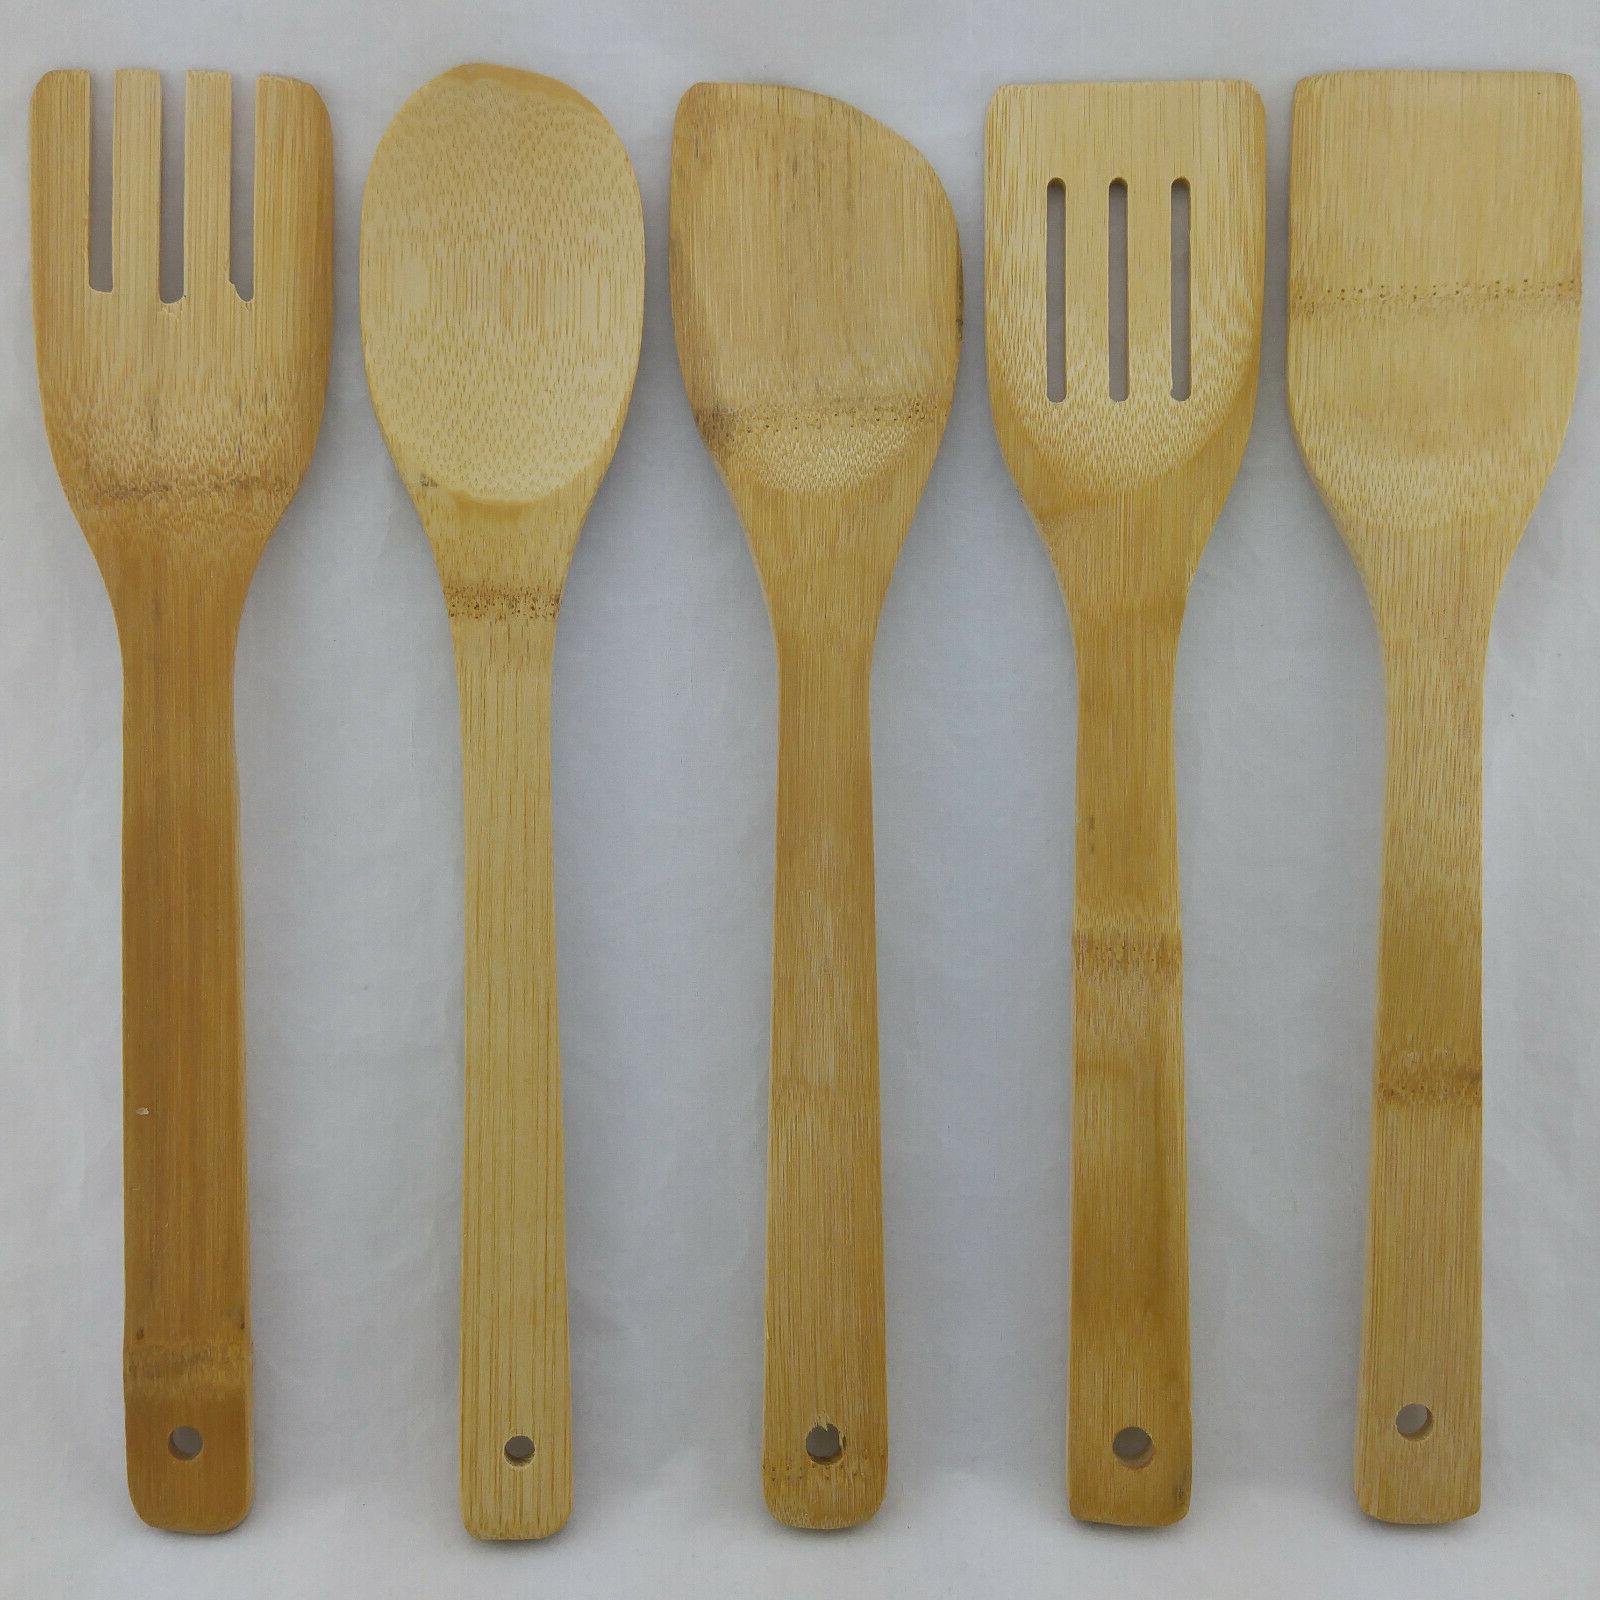 bamboo cooking utensils set of 5 wooden